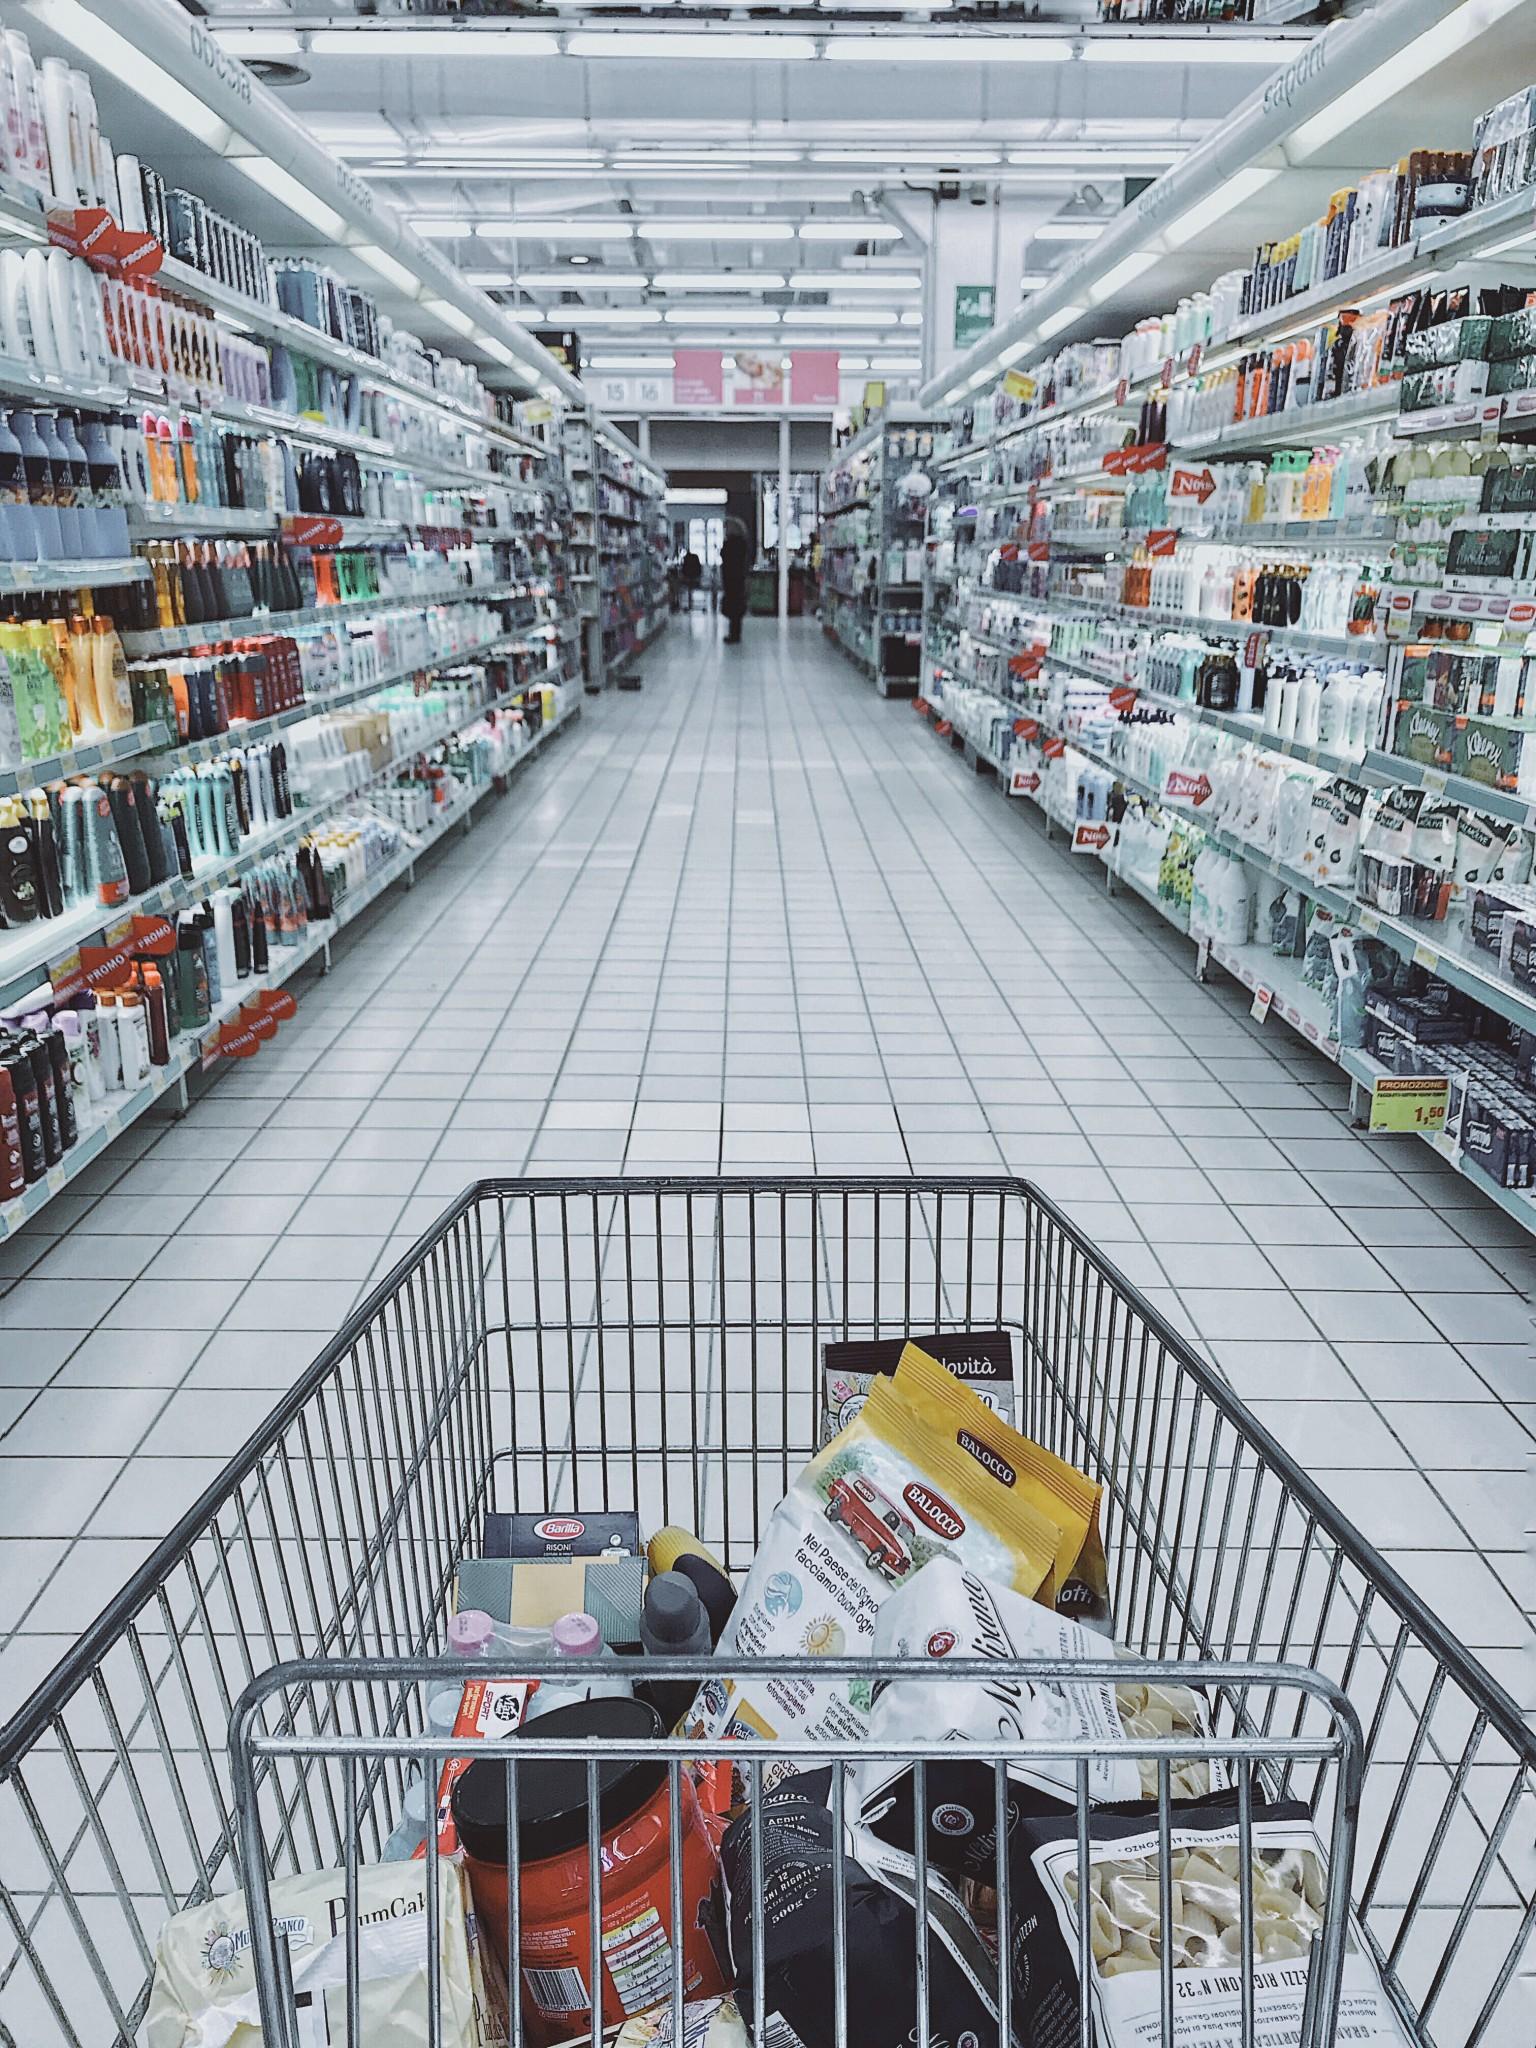 Sainsbury's, Asda and truck tyre tariffs